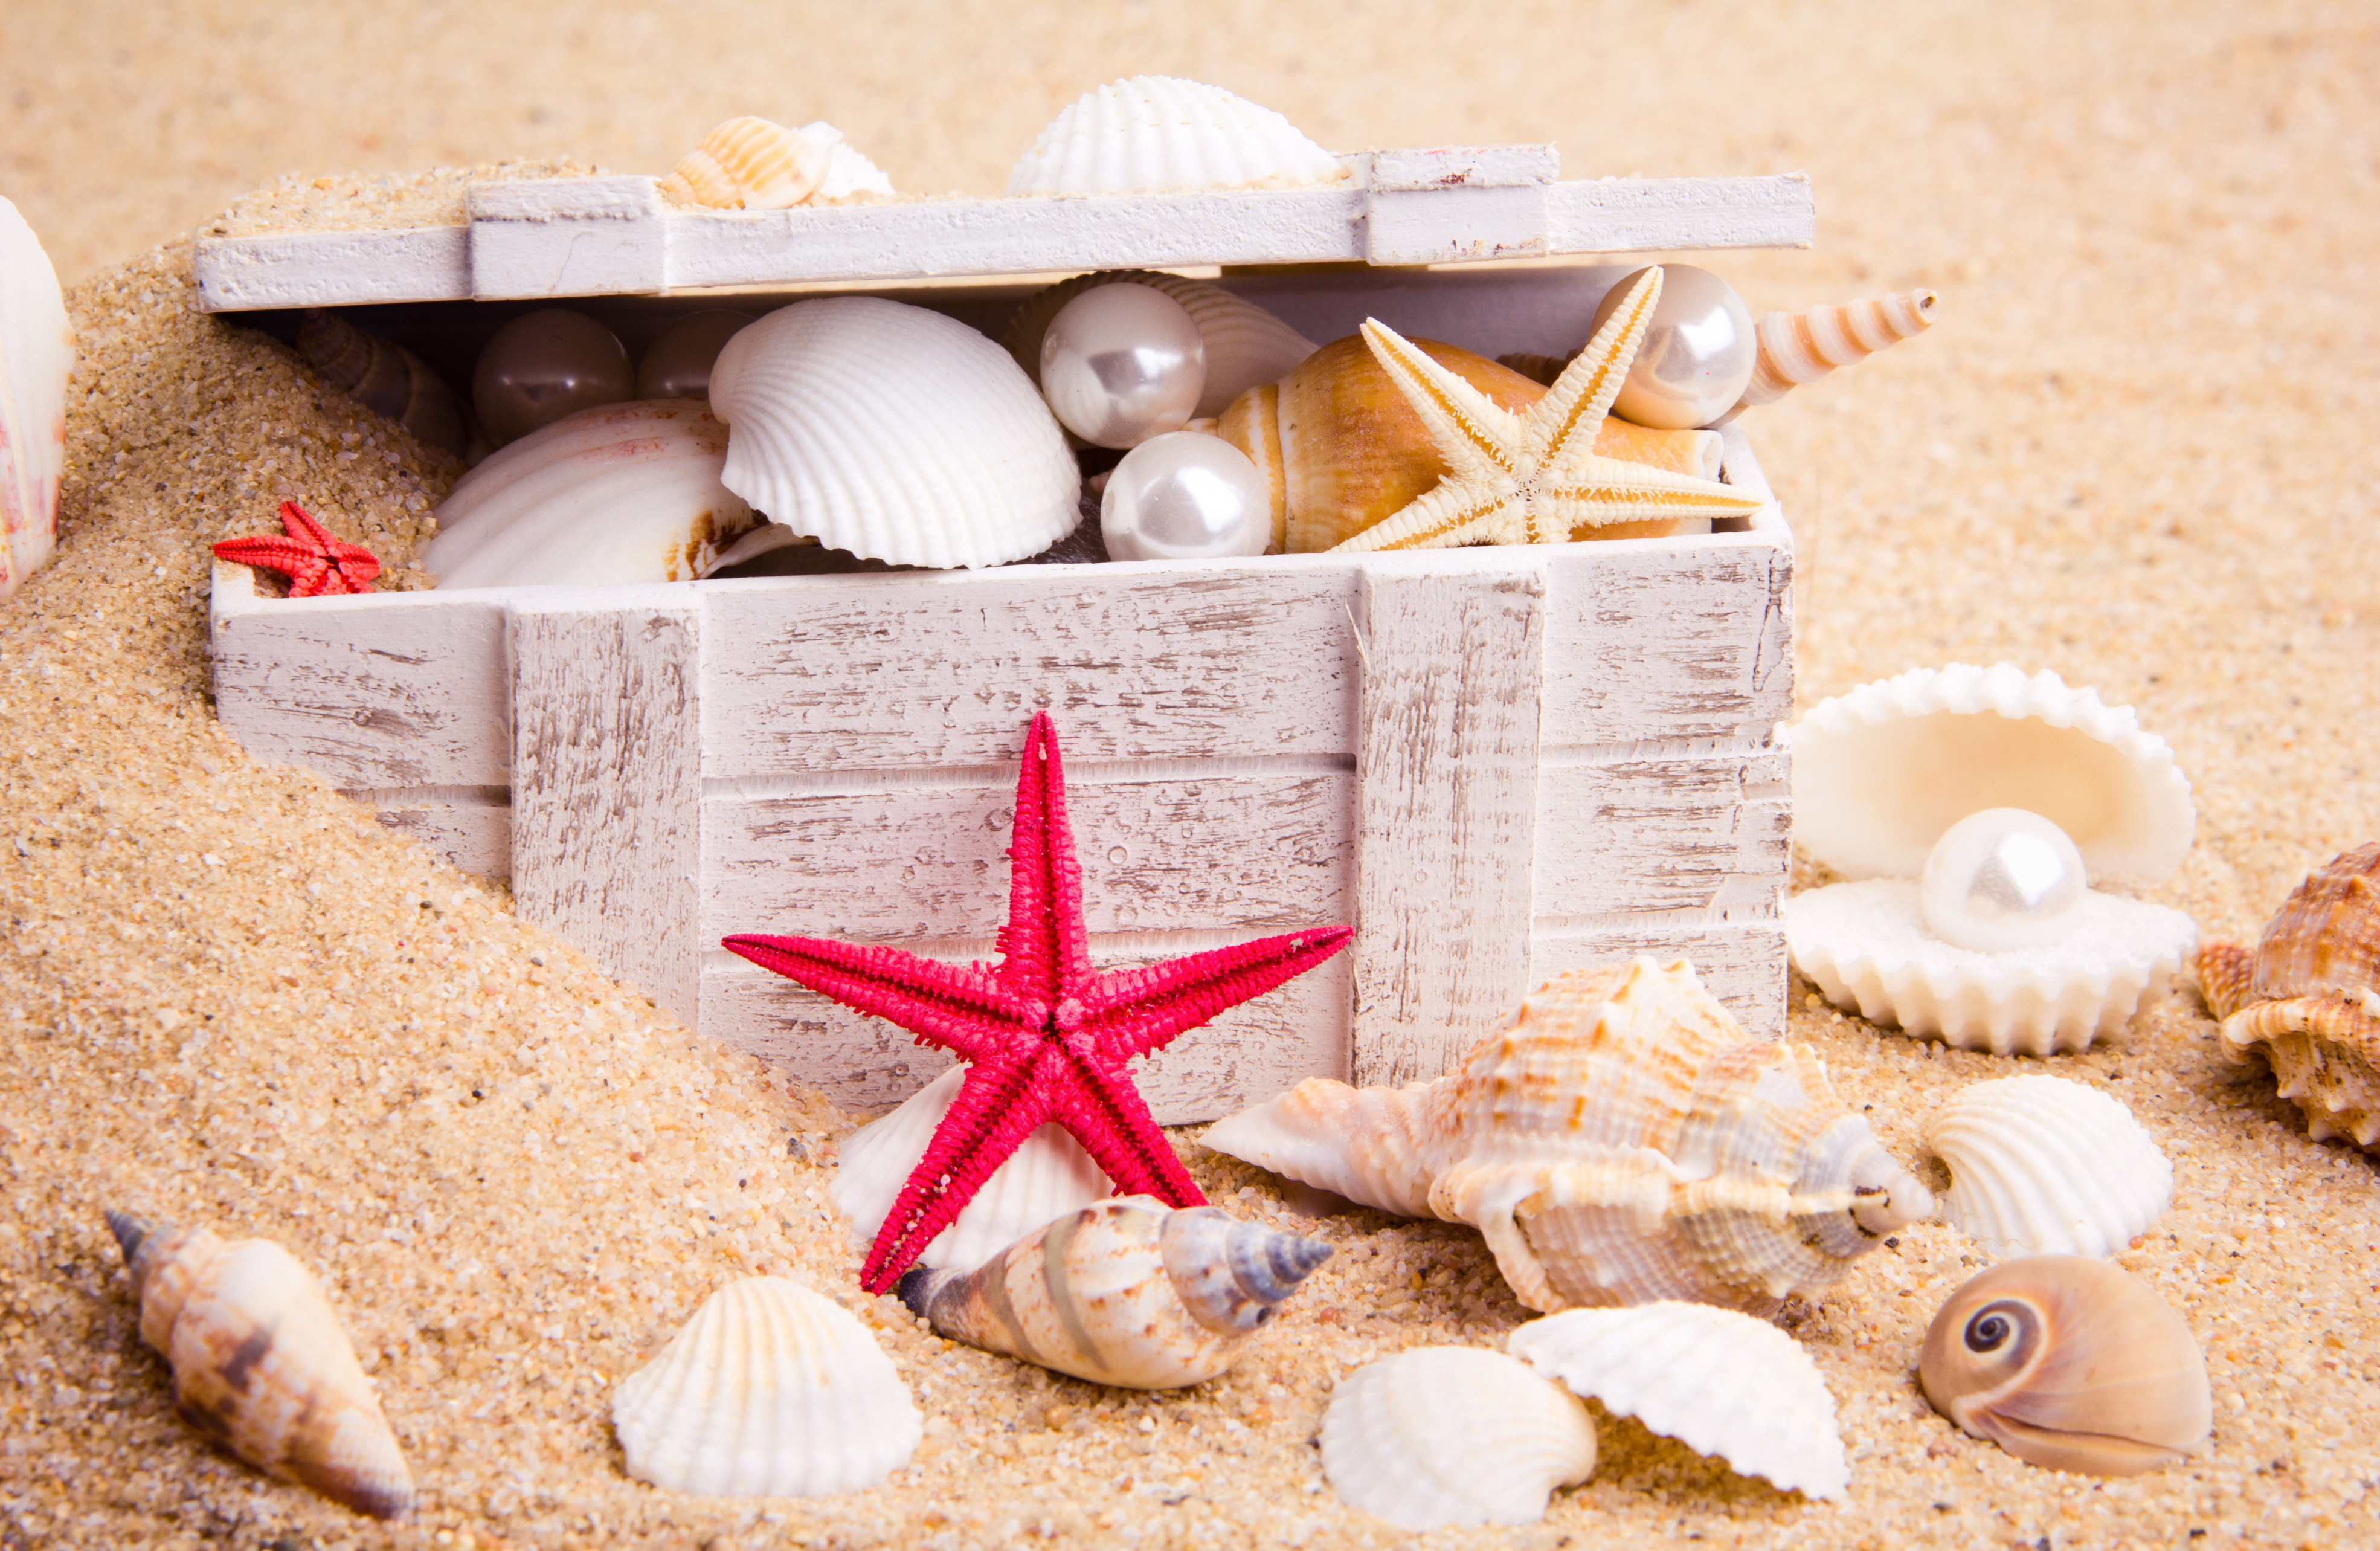 Фото с ракушками и песком